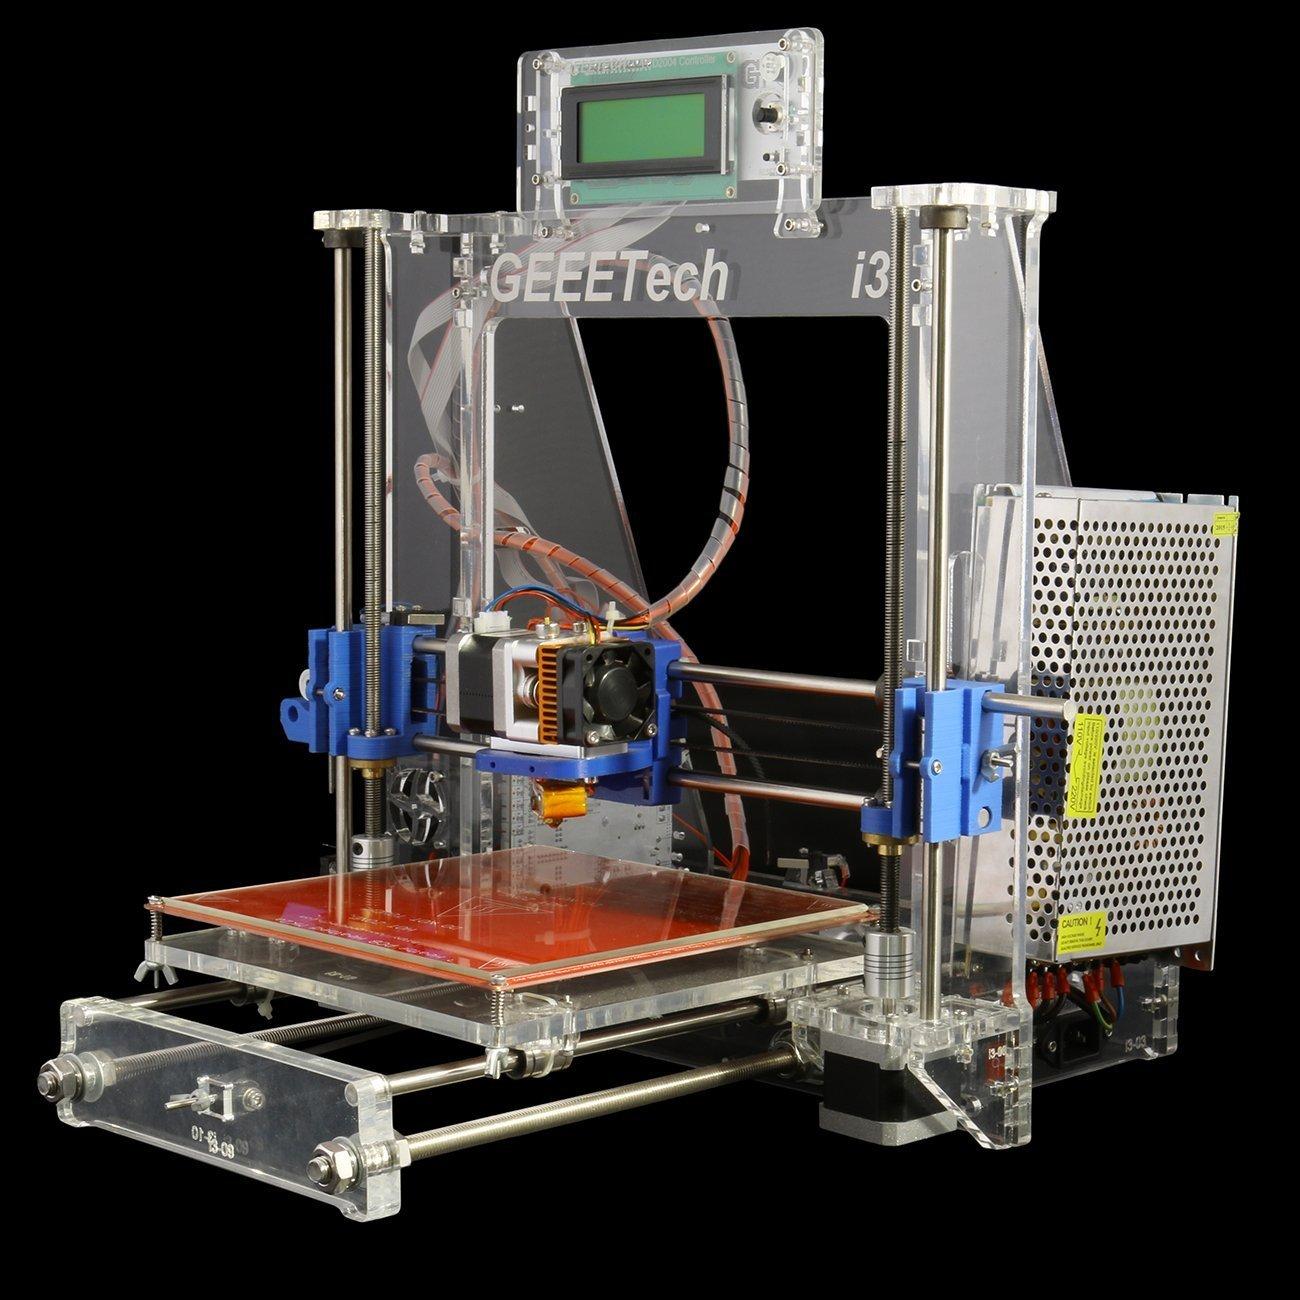 , Waiting for Transparent Aluminum 3D Printers